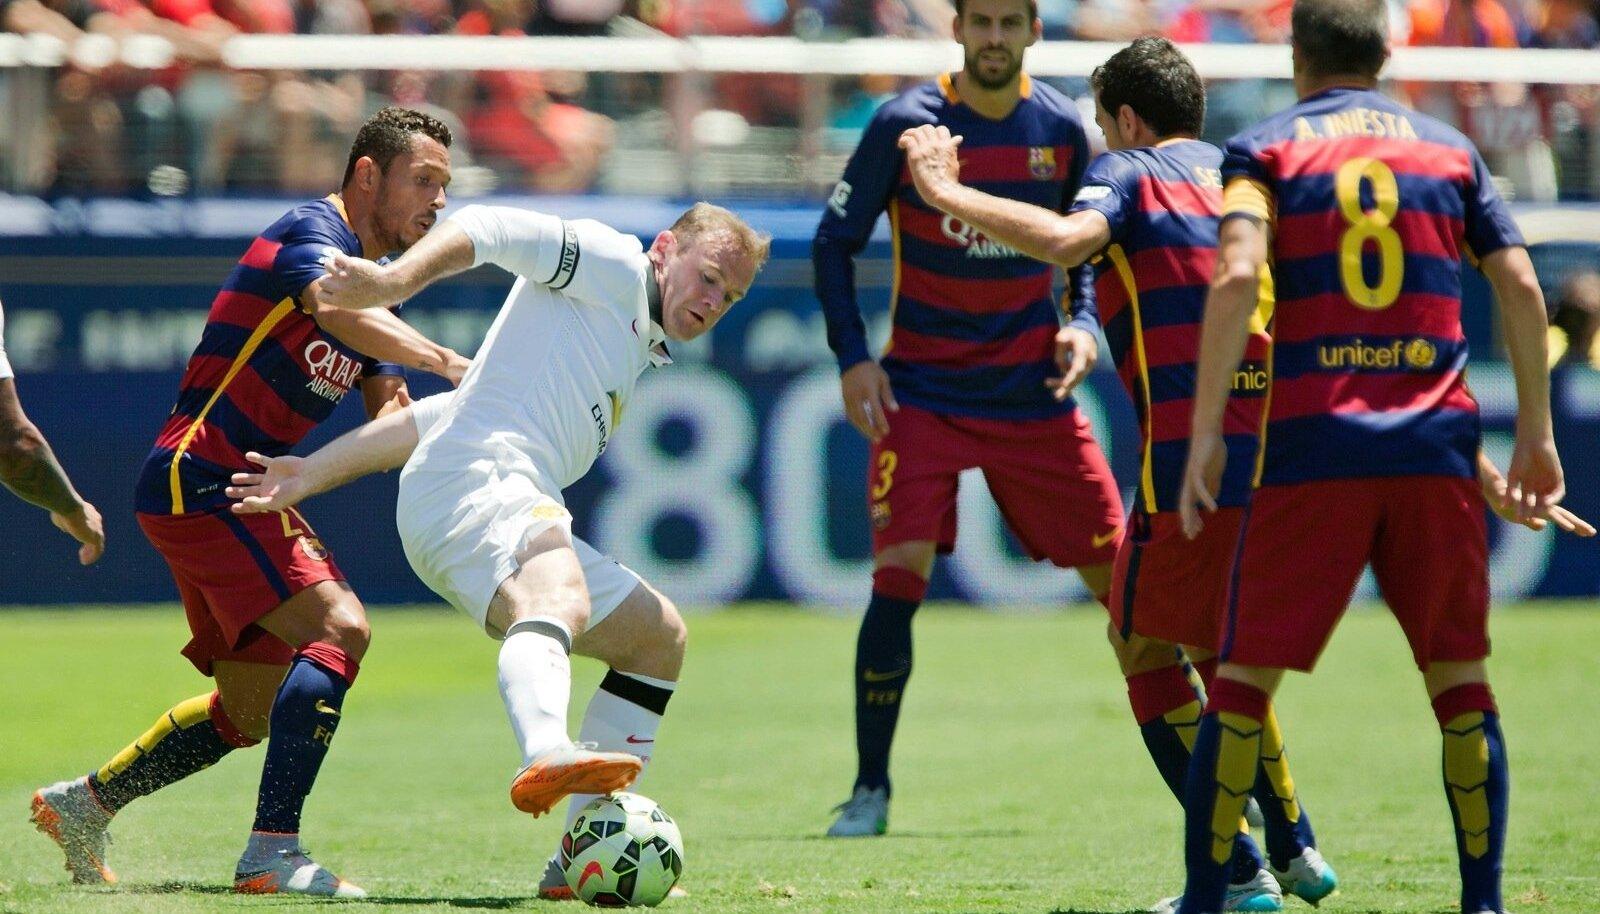 International Champions Cup 2015 - Manchester United v FC Barcelona